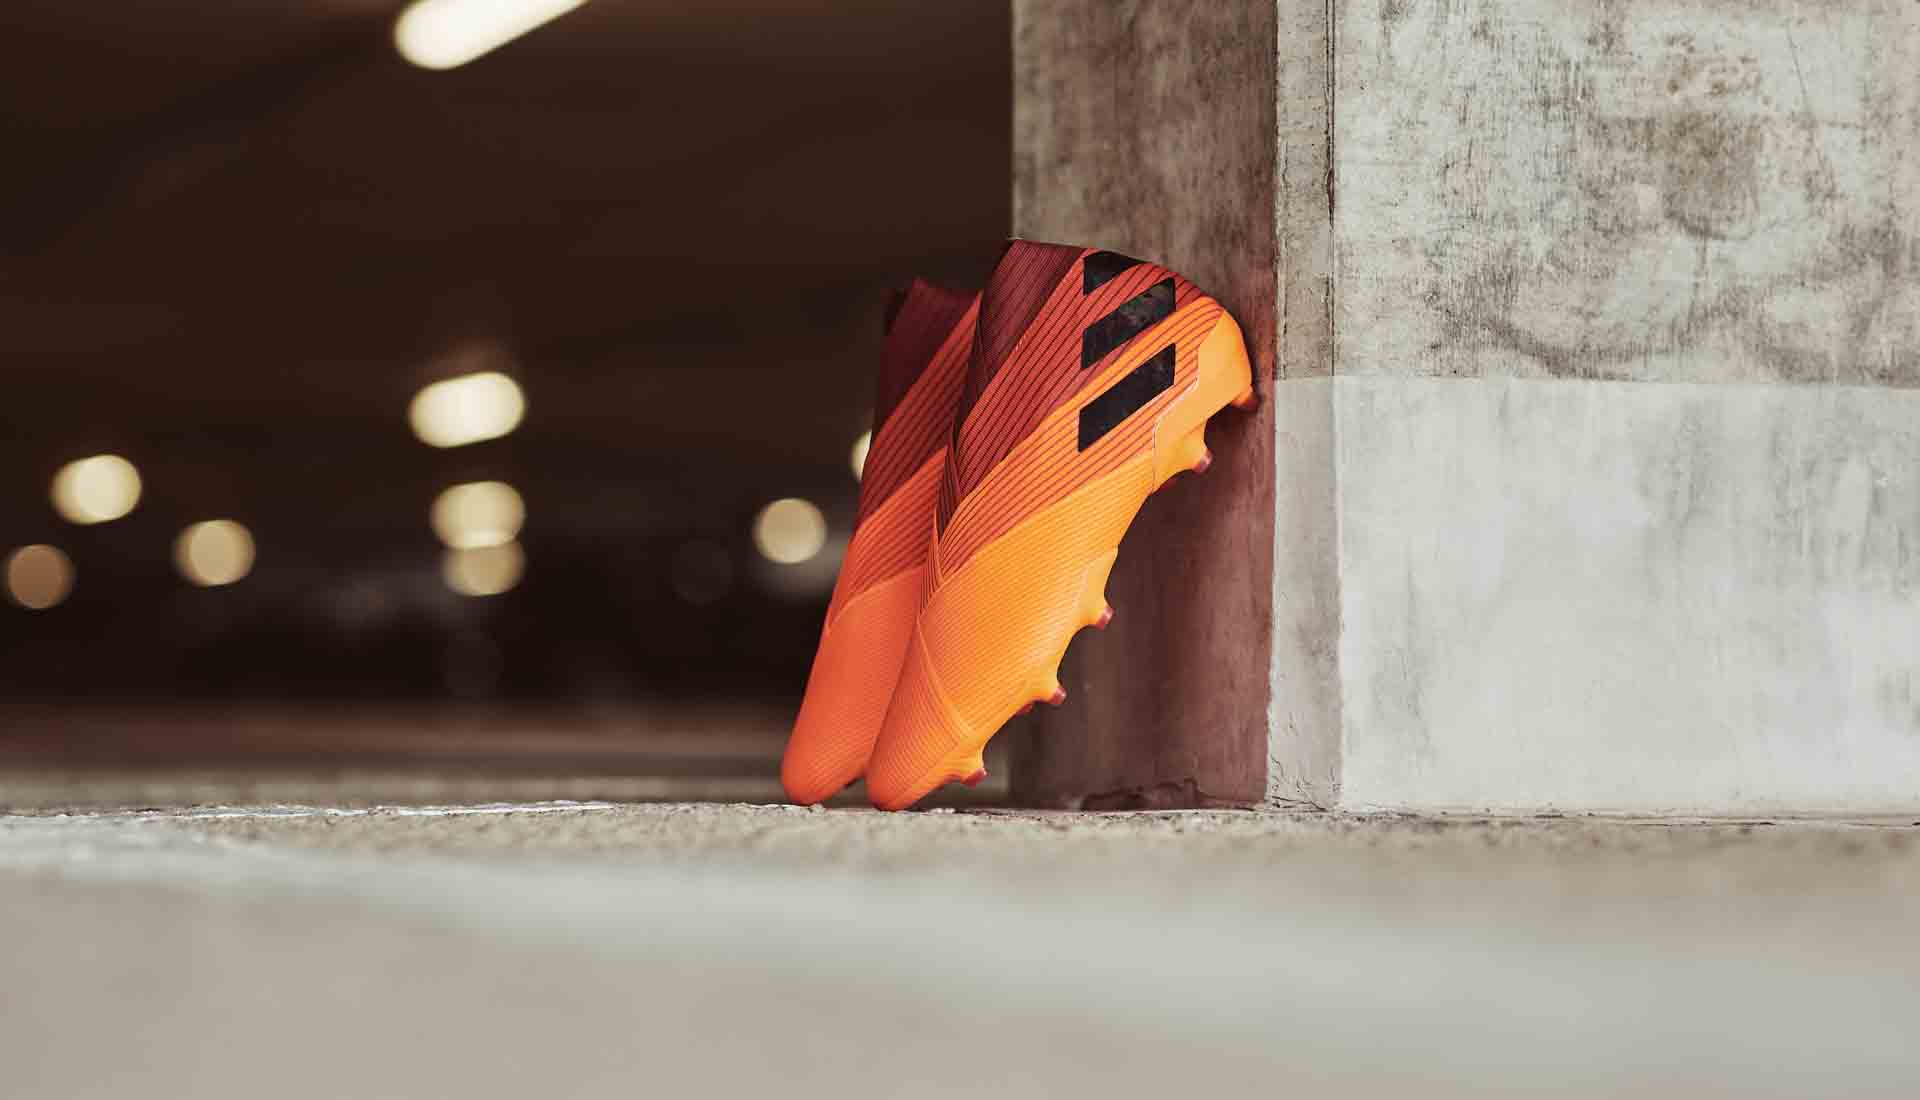 Giay da bong adidas inflight pack moi 2020 (1)